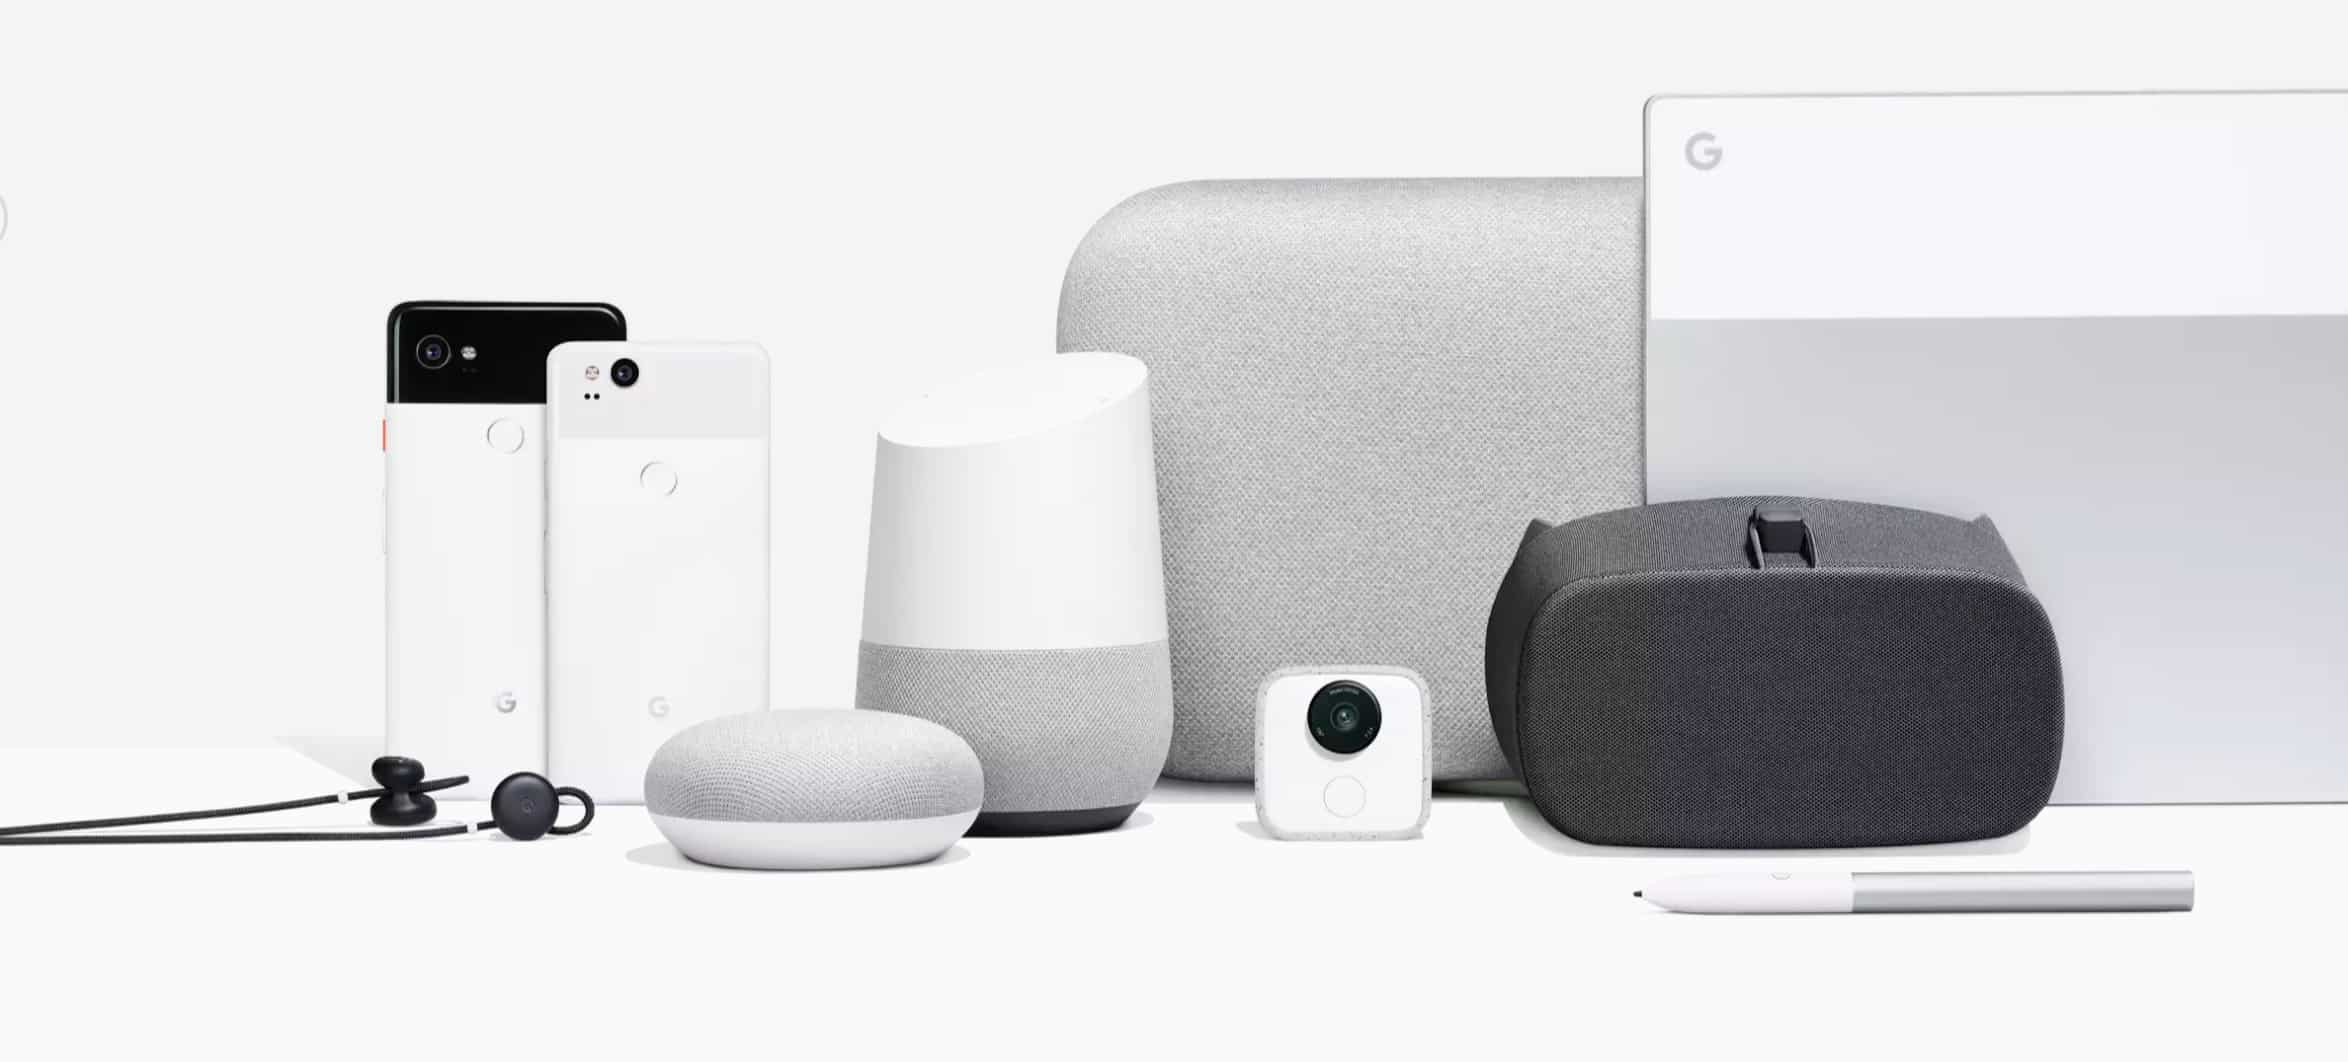 Google Hardware Lineup